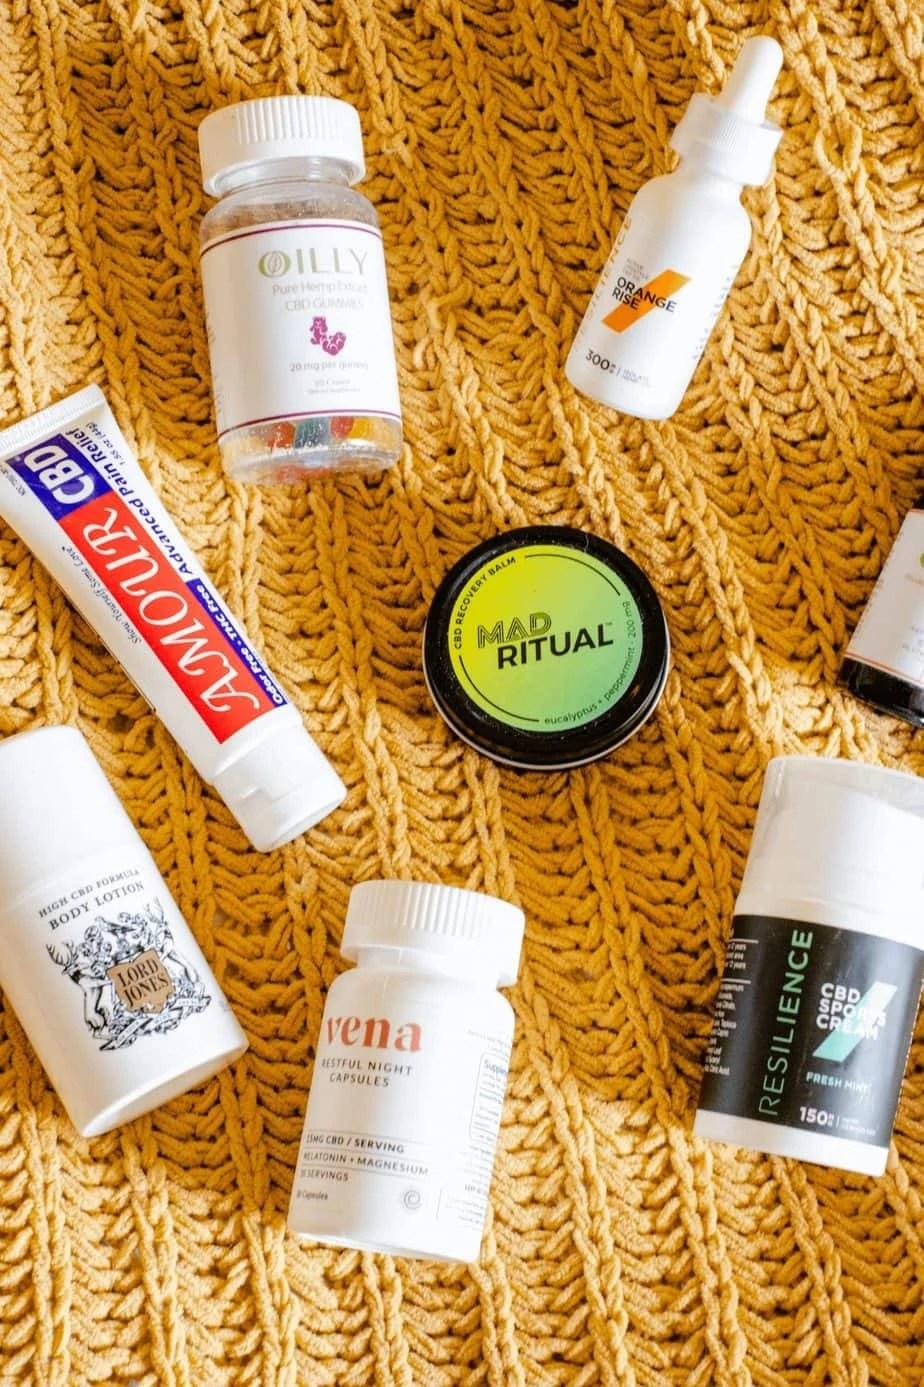 Best CBD Lotion & What To Know Before You Buy #whatsavvysaid #cbdlotion #hempvscannabis #wellnessblogger #lordjones #cbdoil